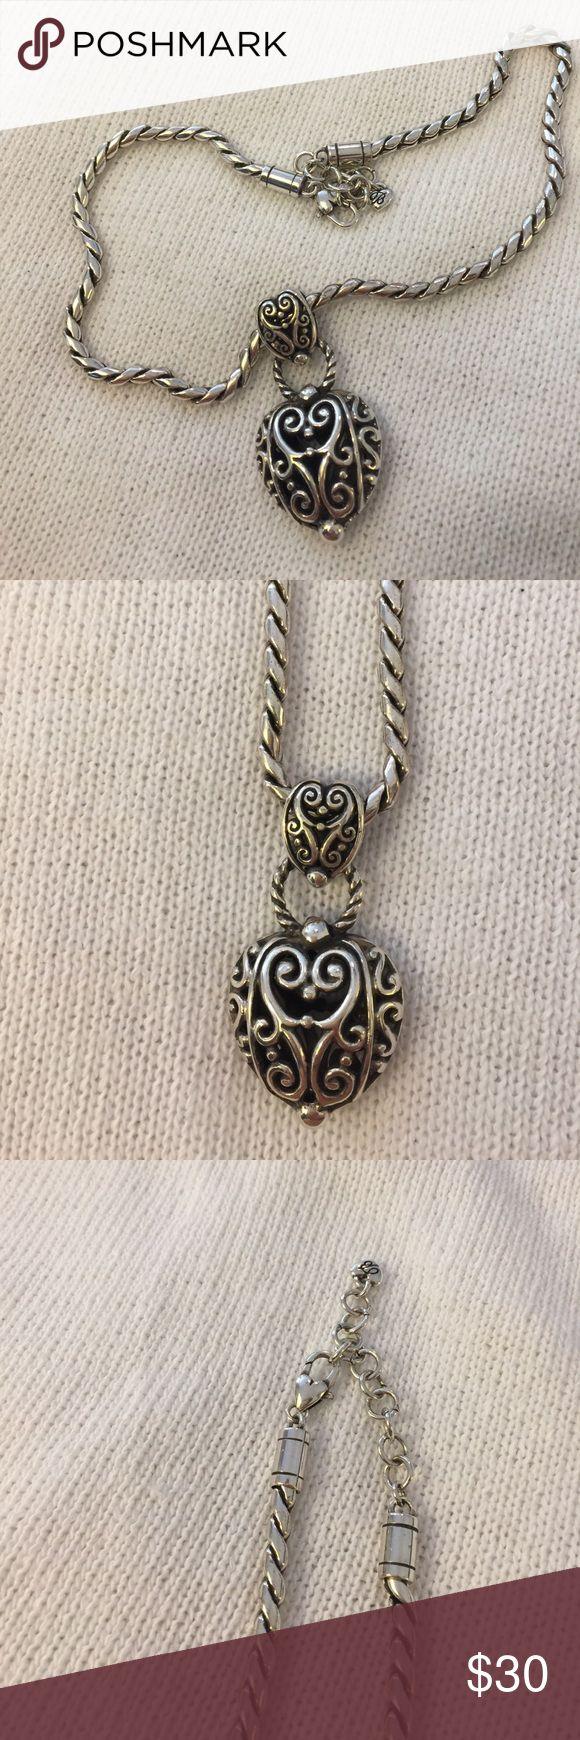 Best 25 Brighton Jewelry Necklace Ideas On Pinterest